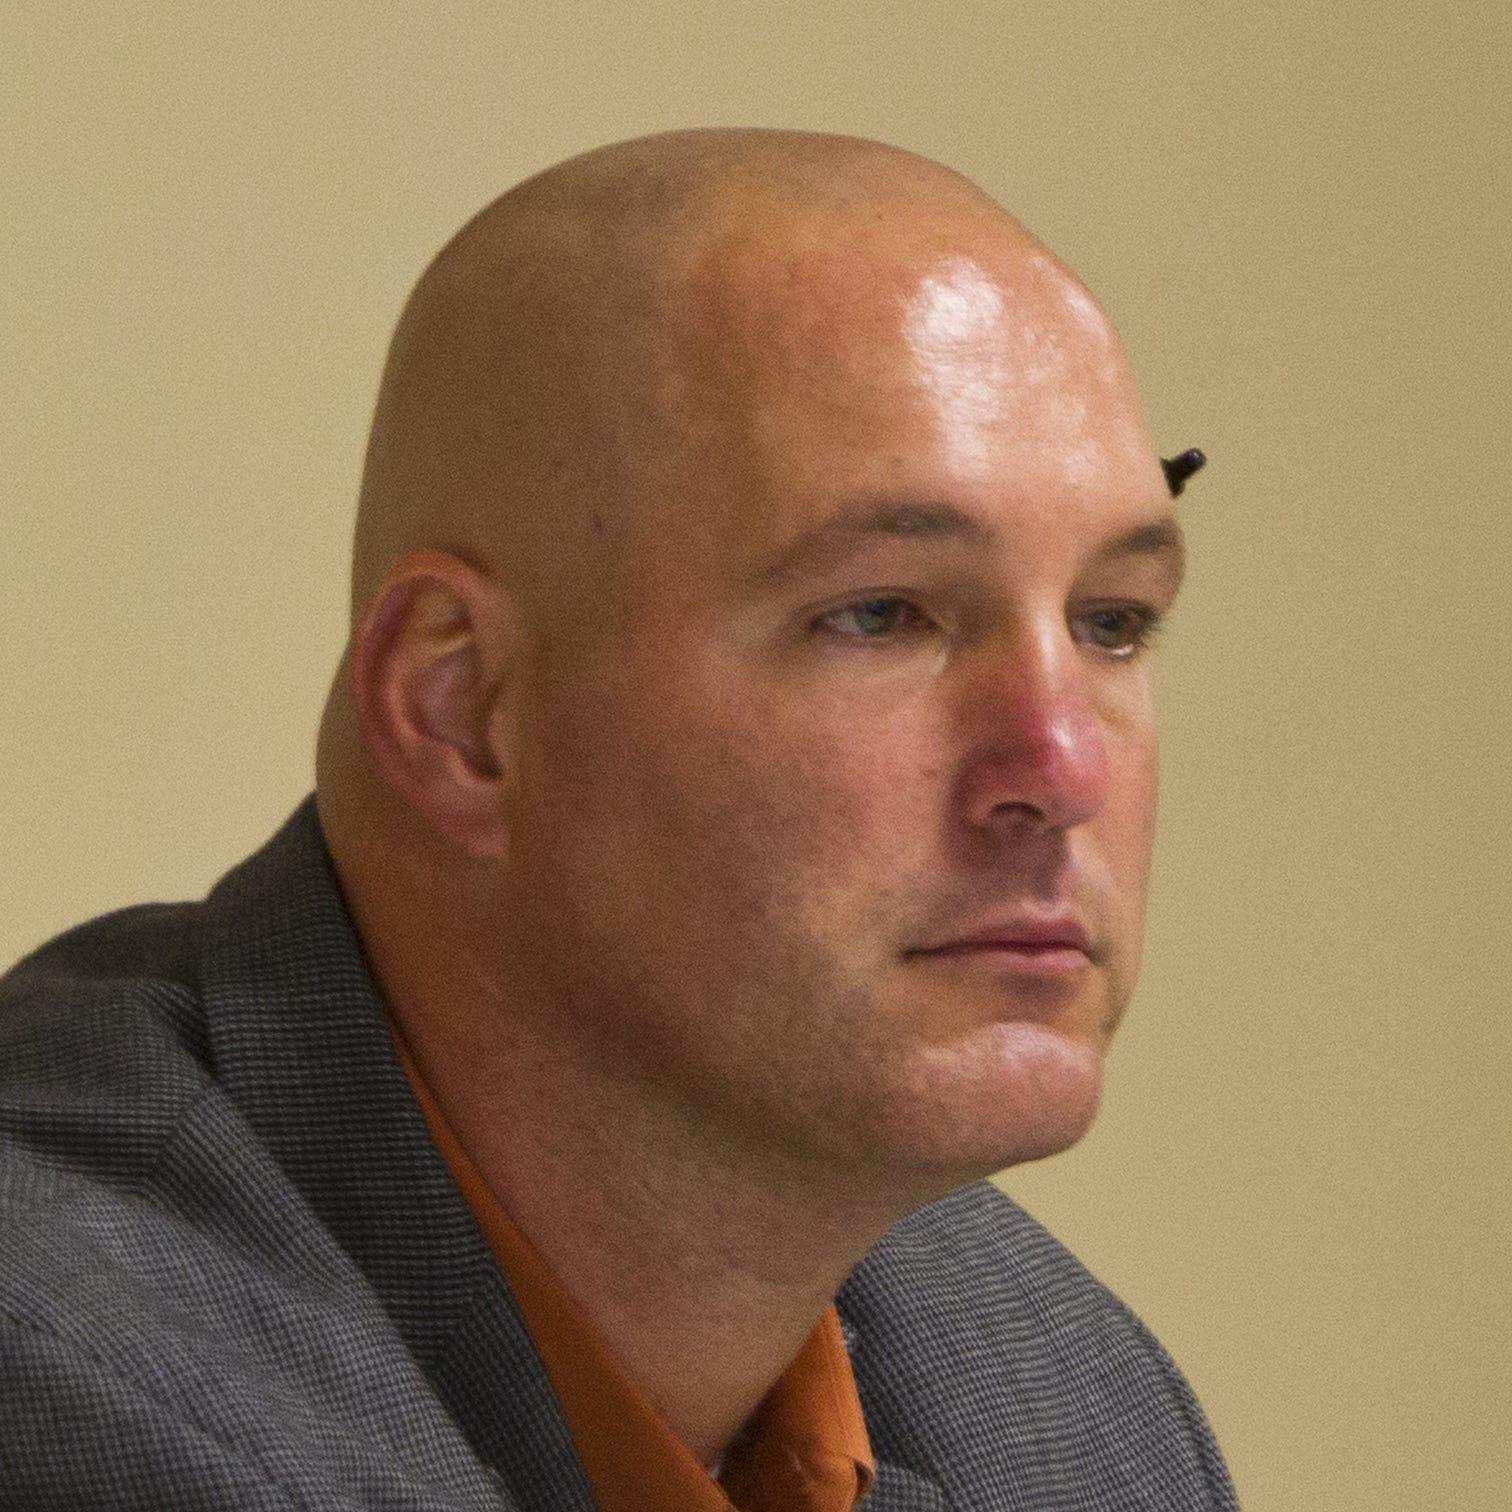 Carbon monoxide poisoning killed Superintendent Destin Haas